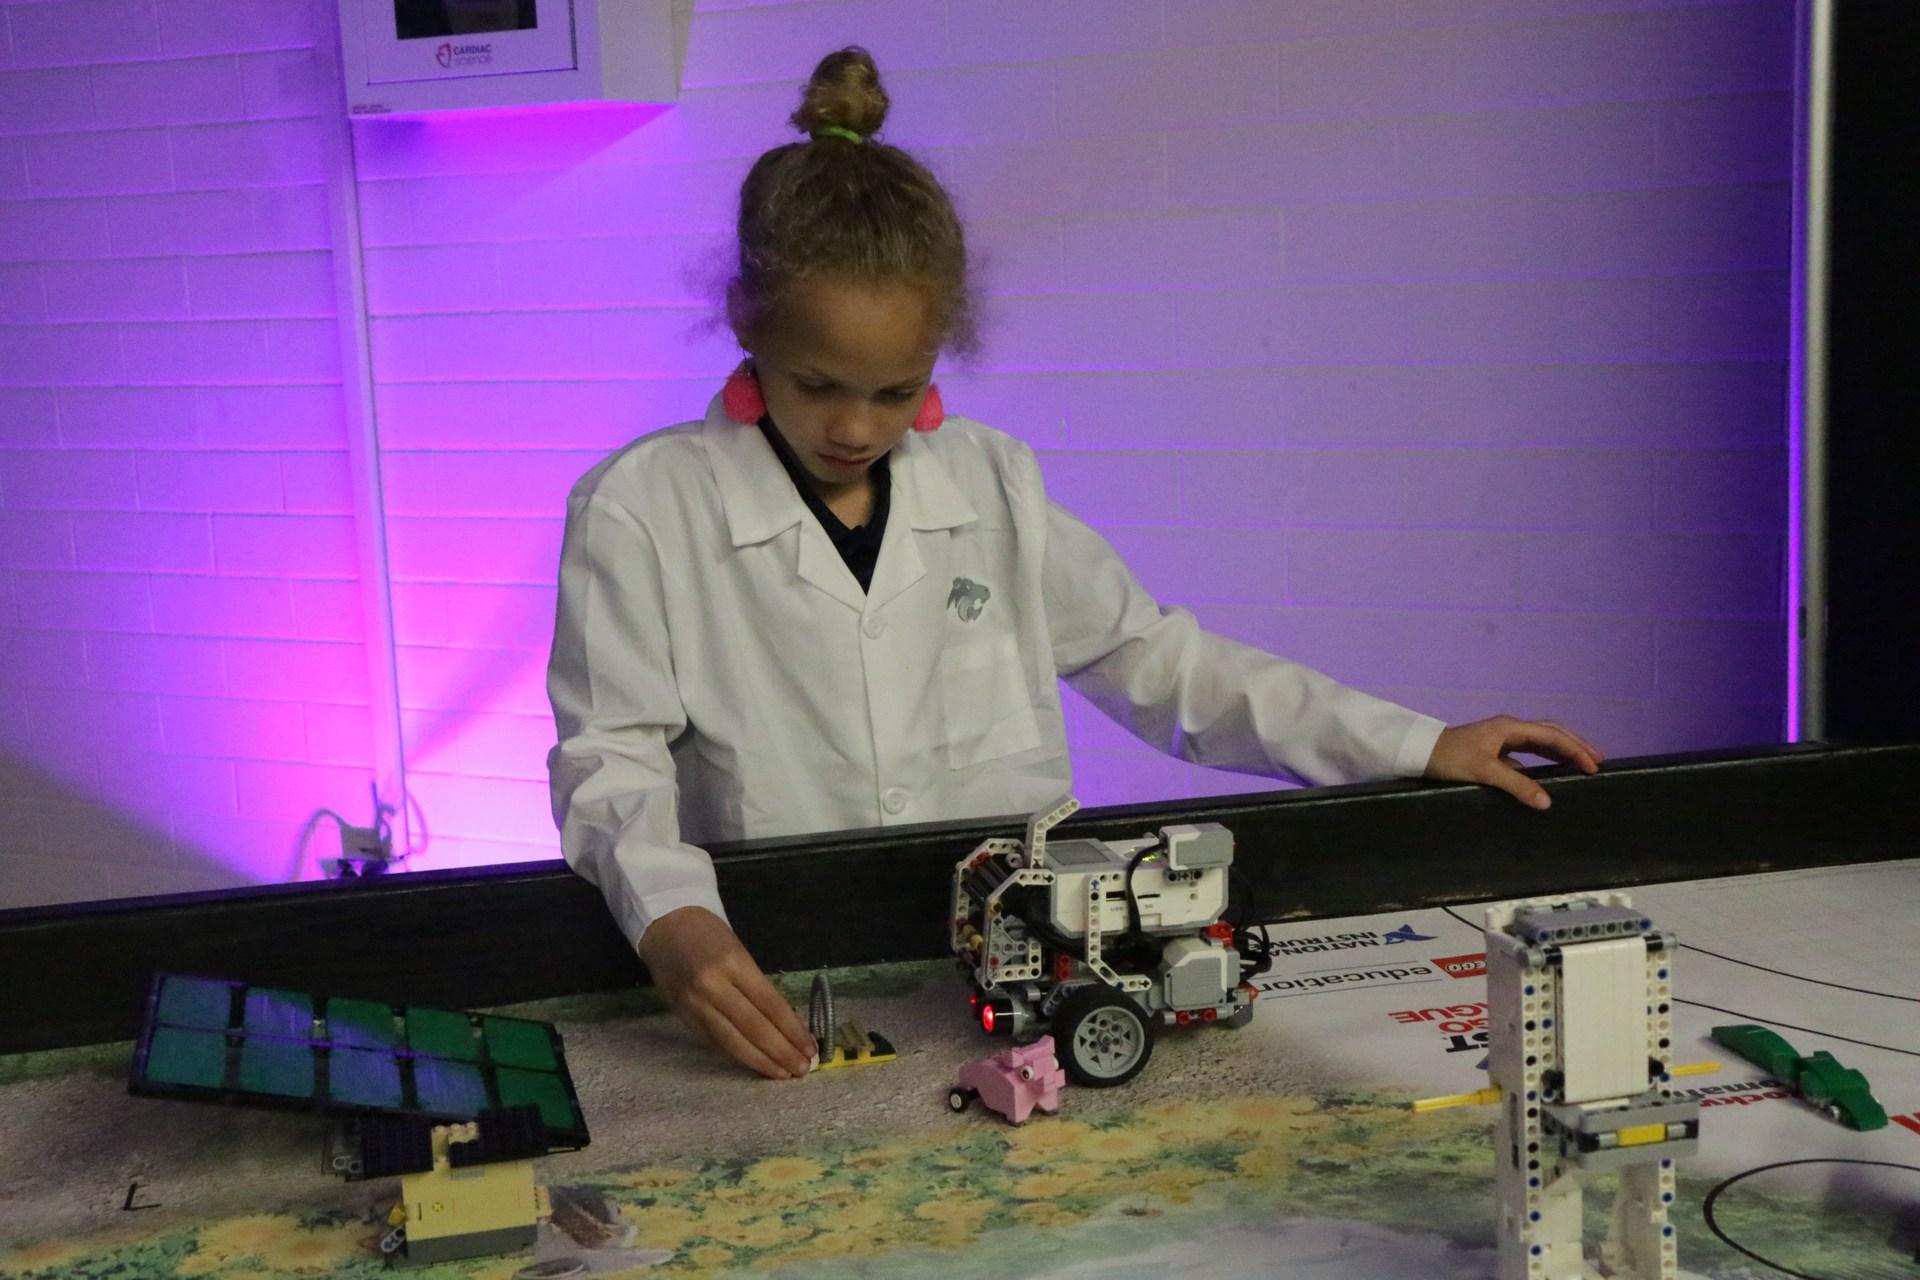 robotics students show their skills